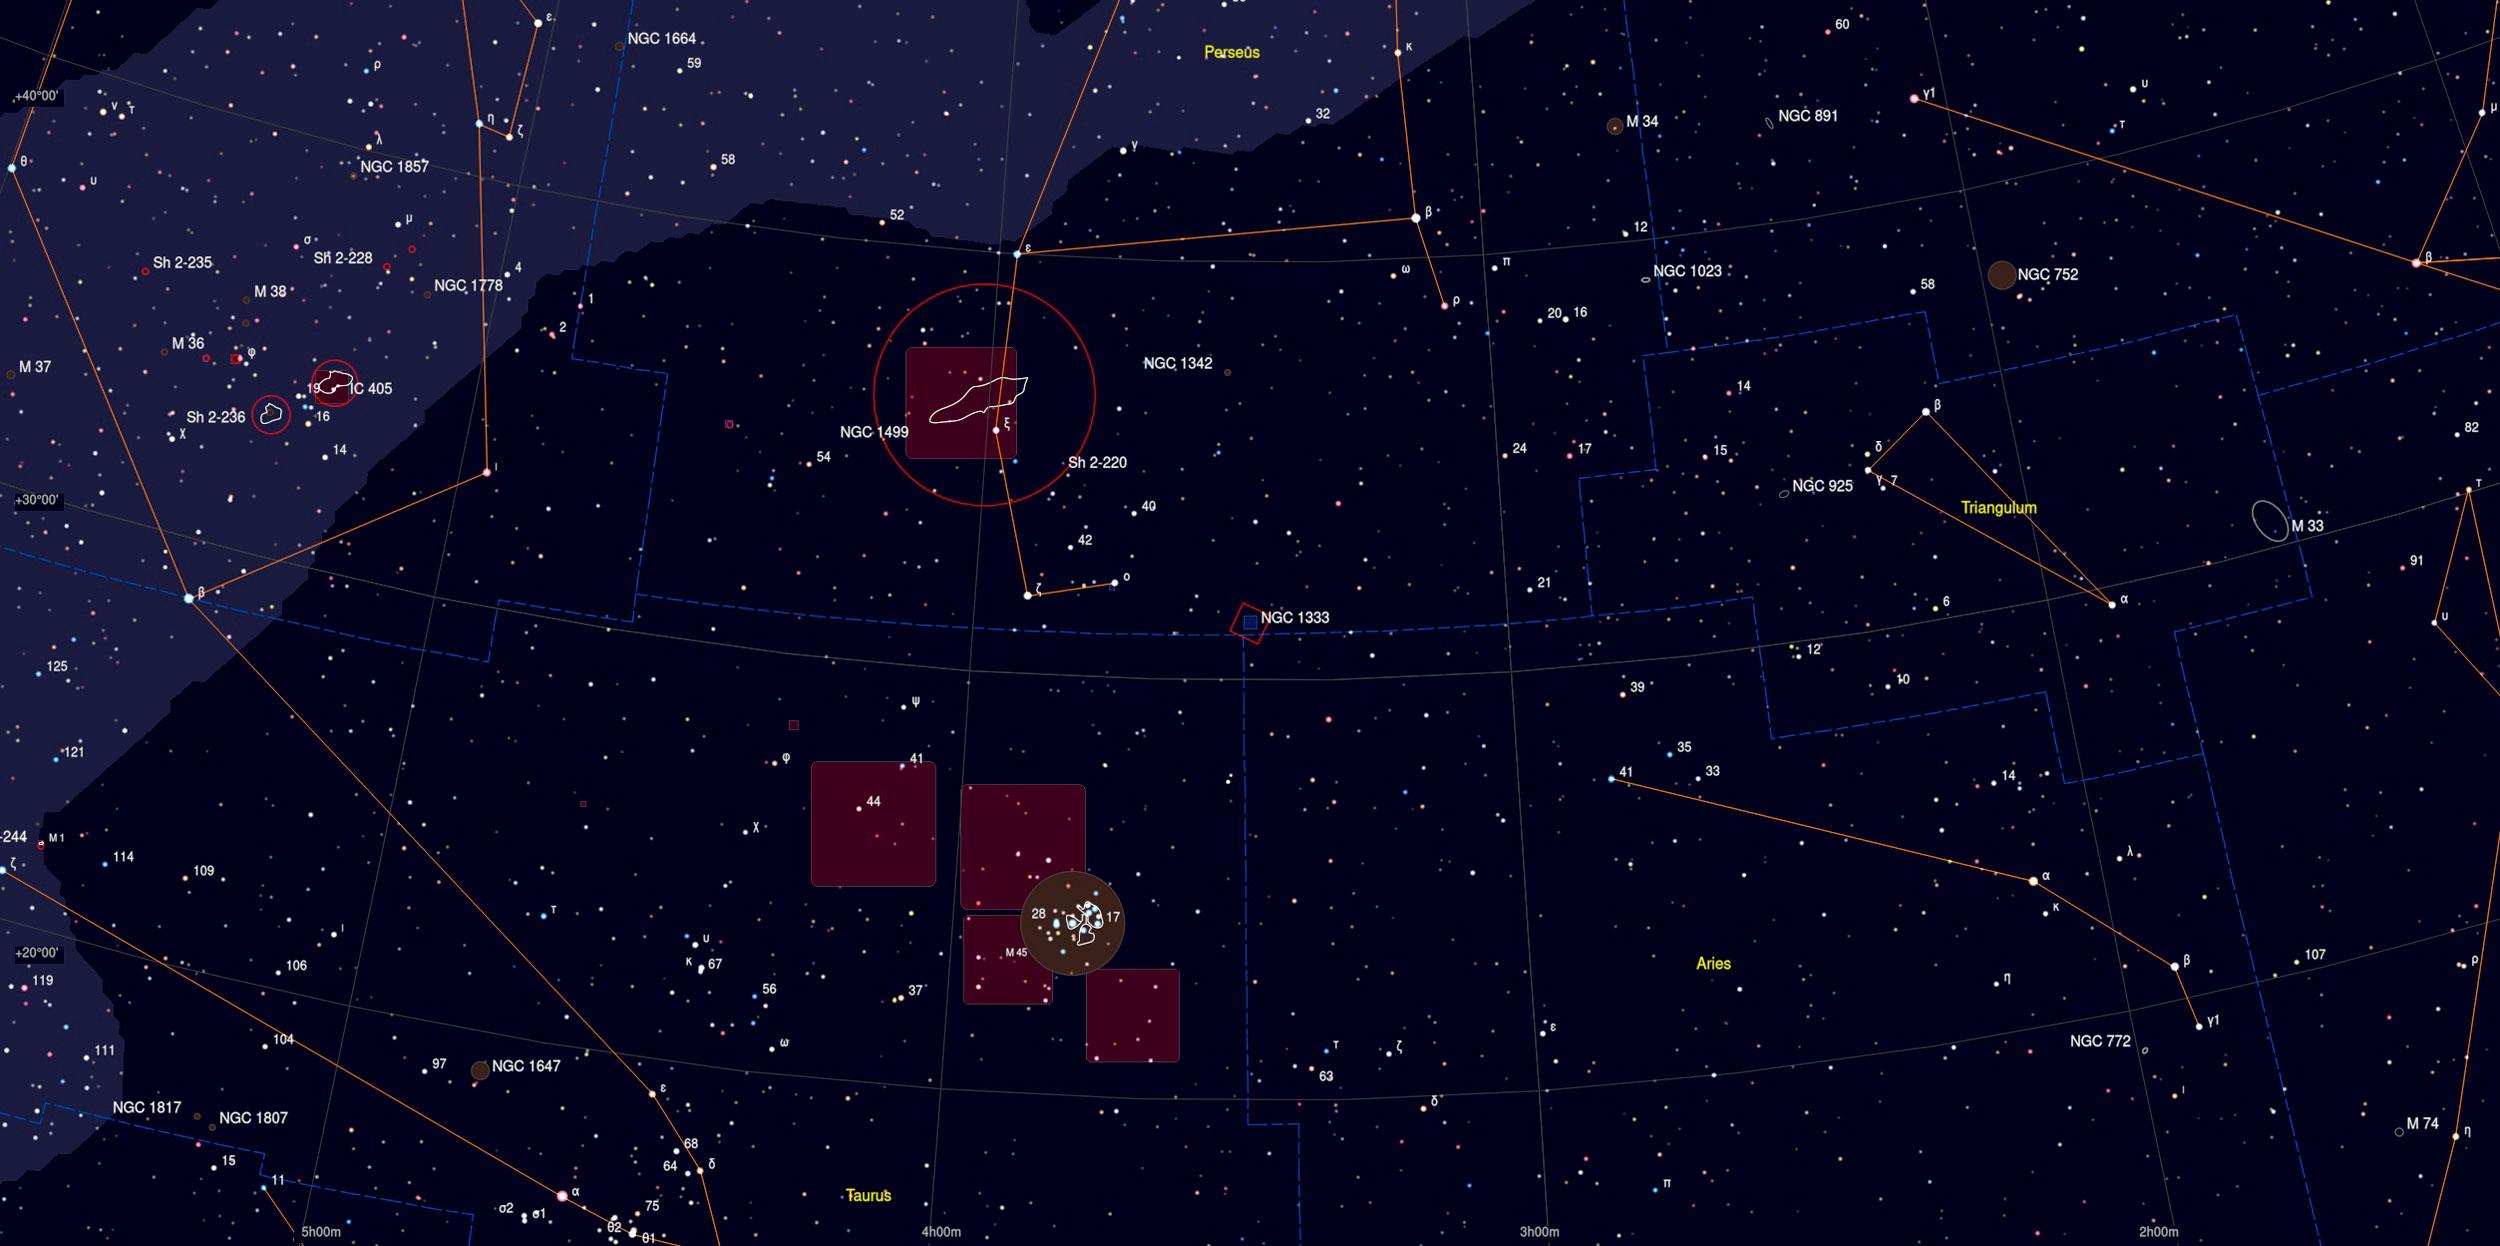 NGC 1333 Sky Chart - Astrophotography Martin Rusterholz